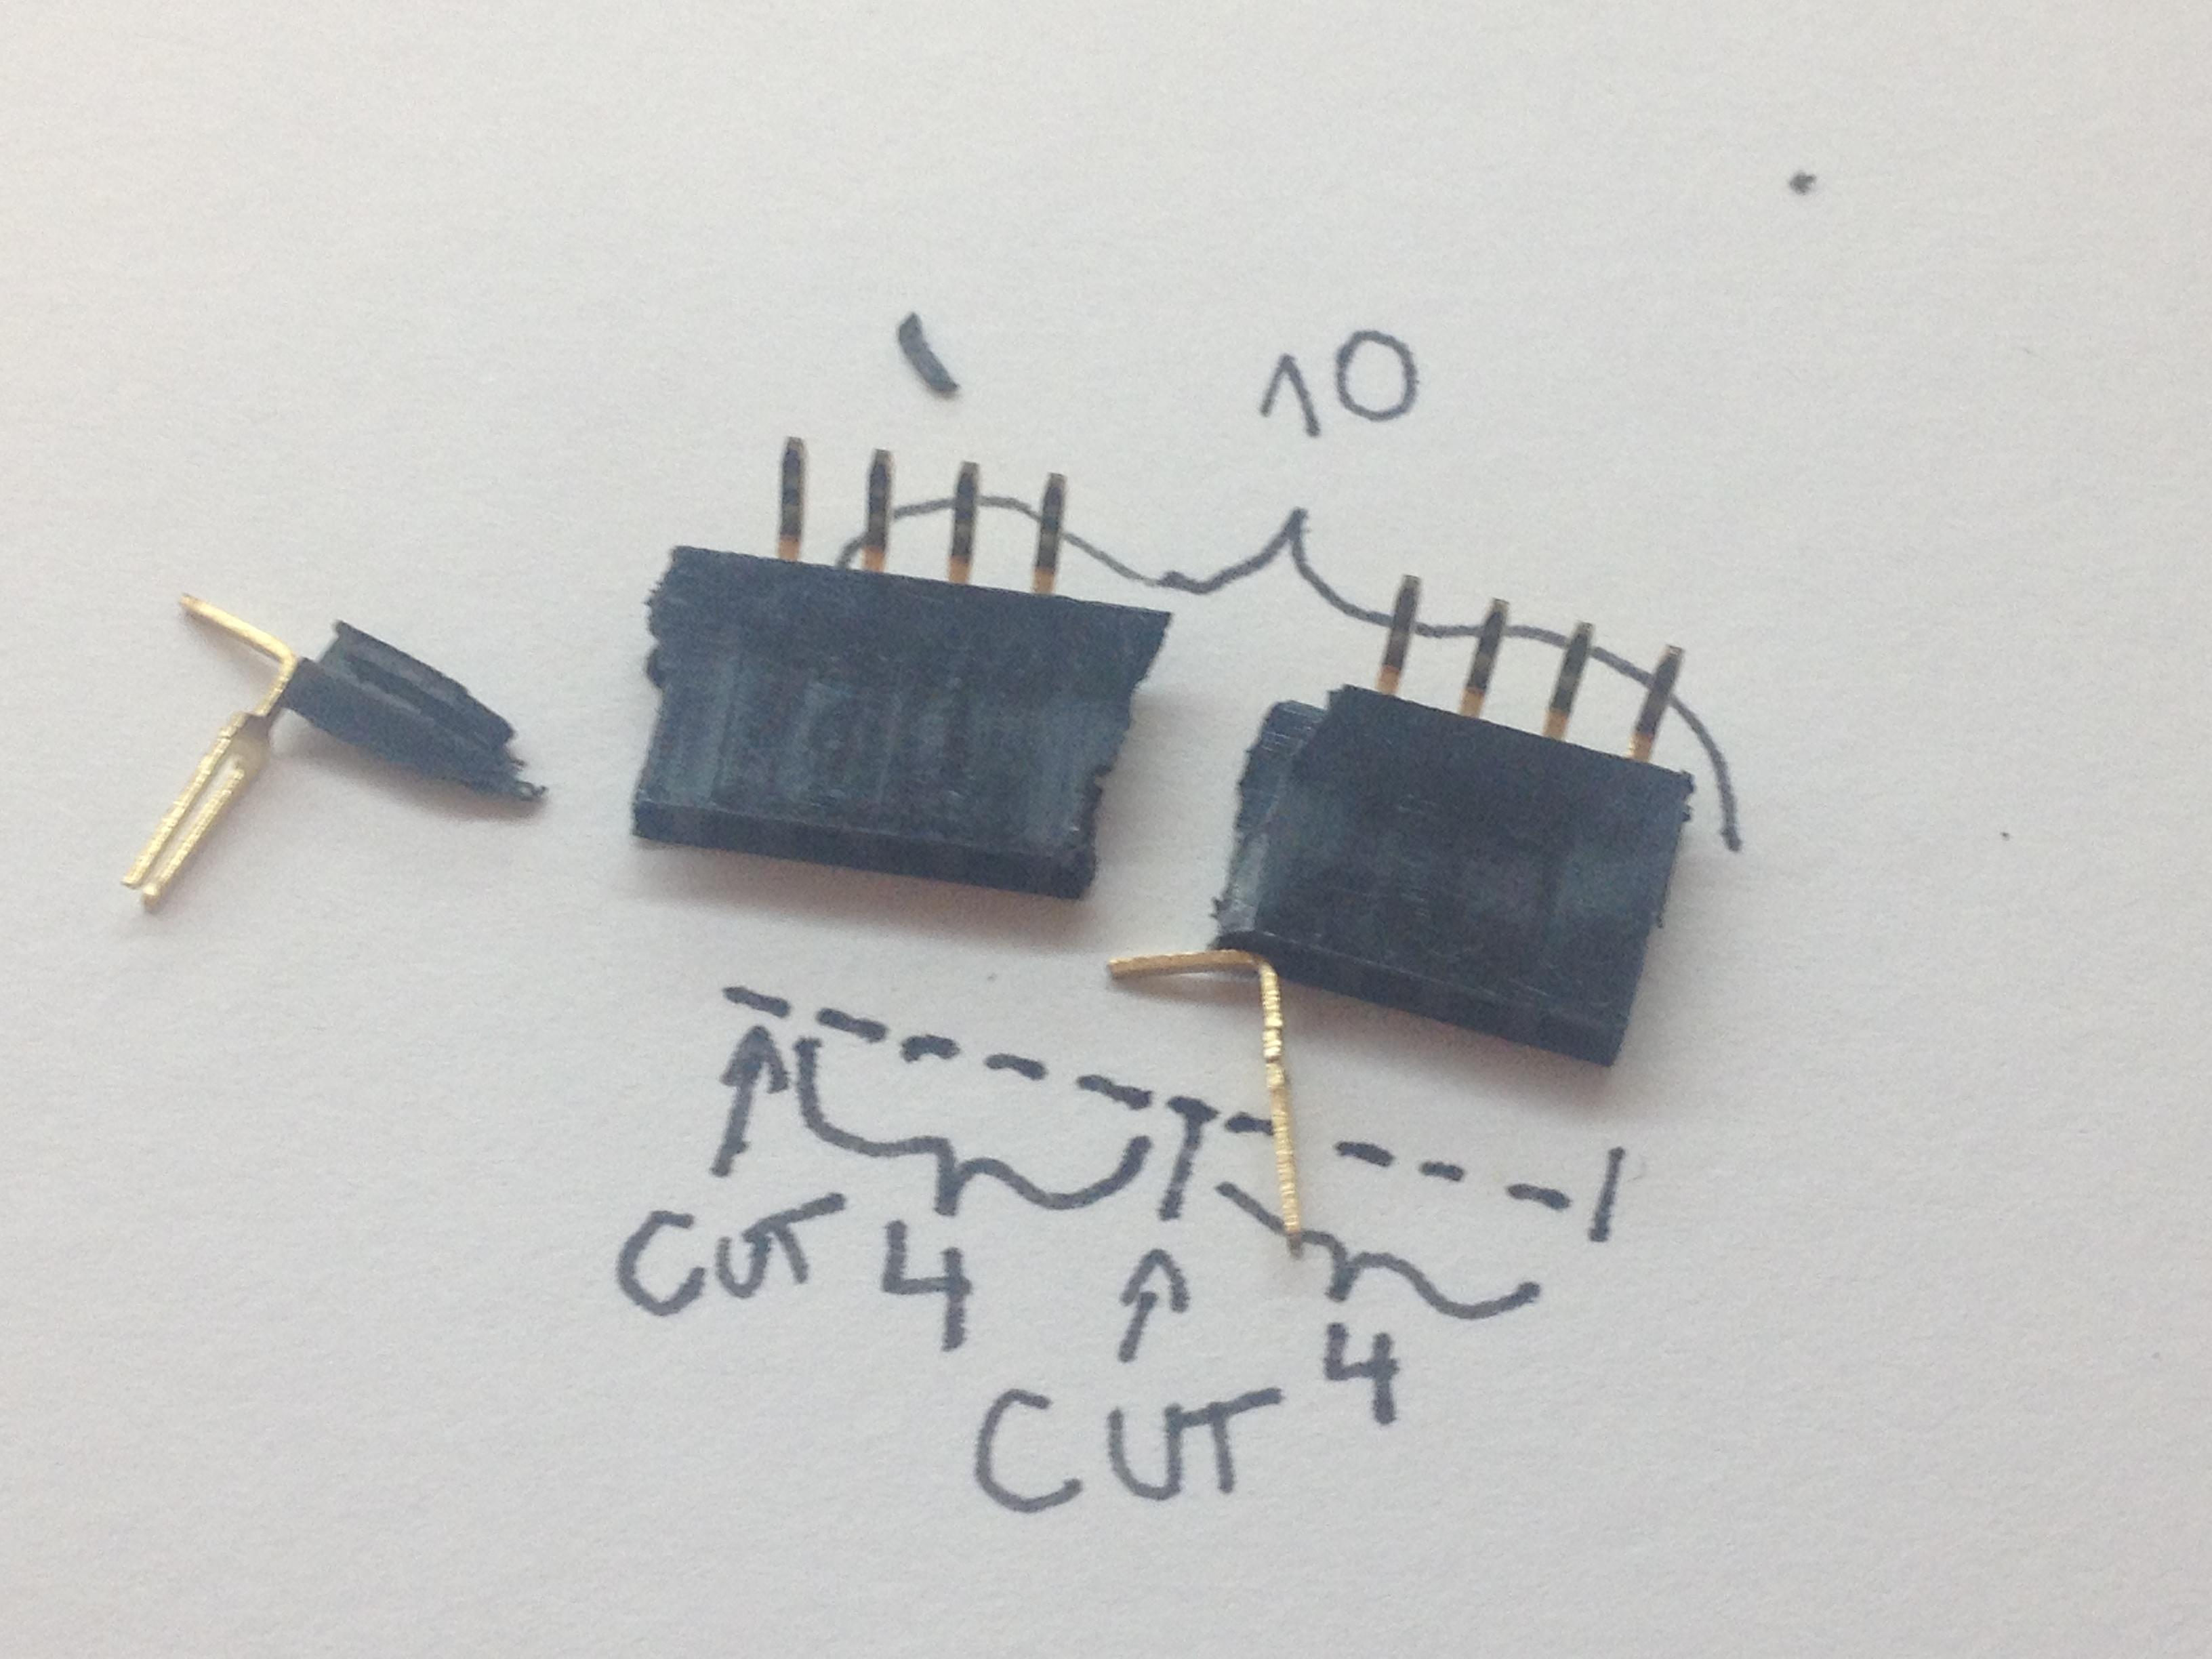 Picture of Prepare the 4 Pin Angle Female Headers